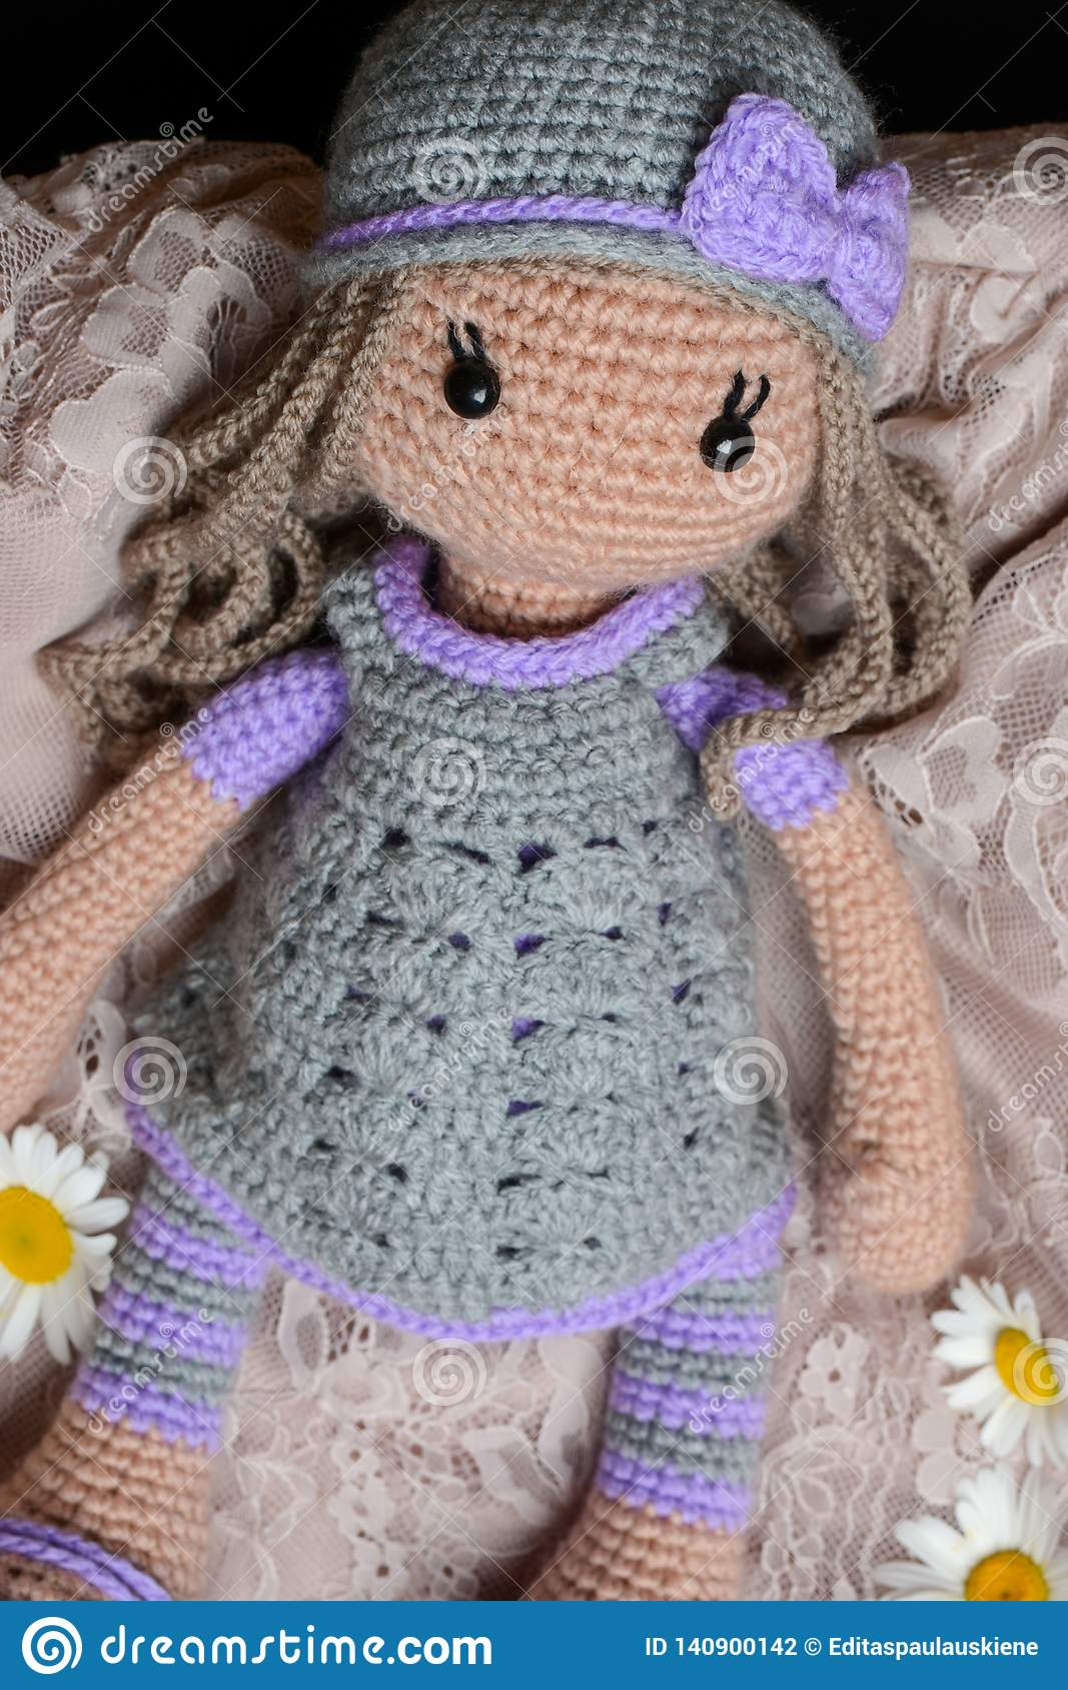 crochet Bunny, a crochet toy for a newborn or child gift, newborn ... | 1689x1067